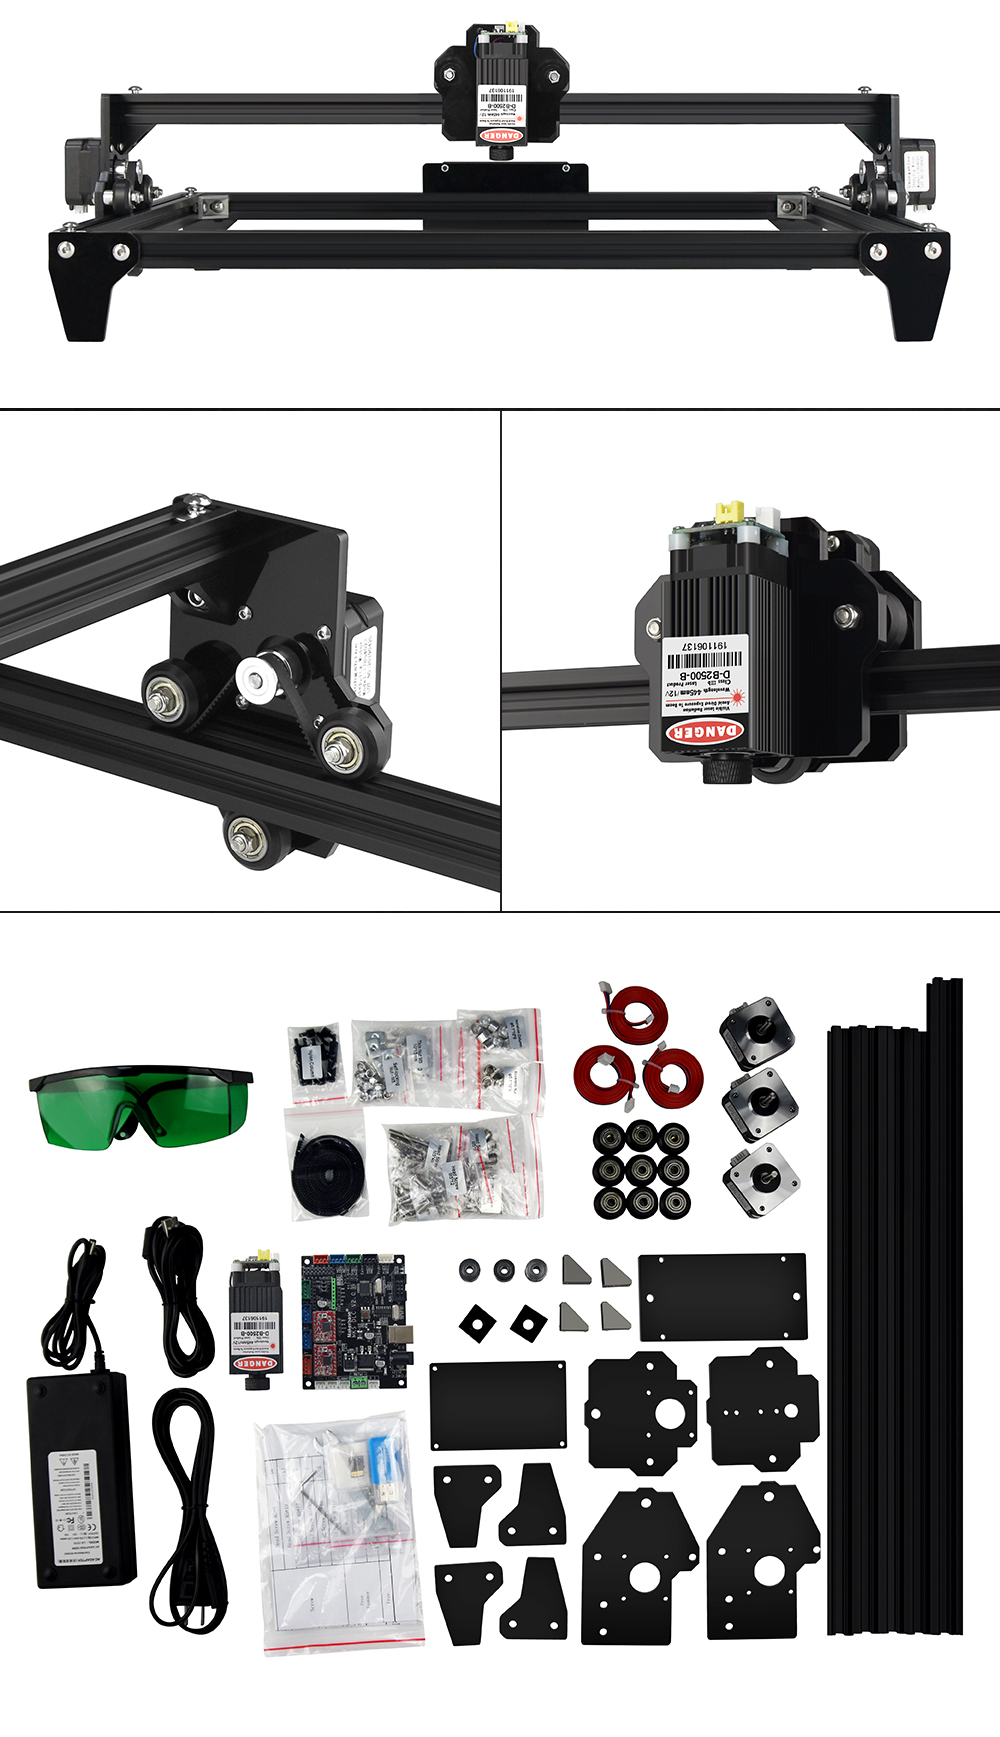 2-Axis 2500mW Laser Engraving Machine/Desktop Wood Router/Cutter/Printer